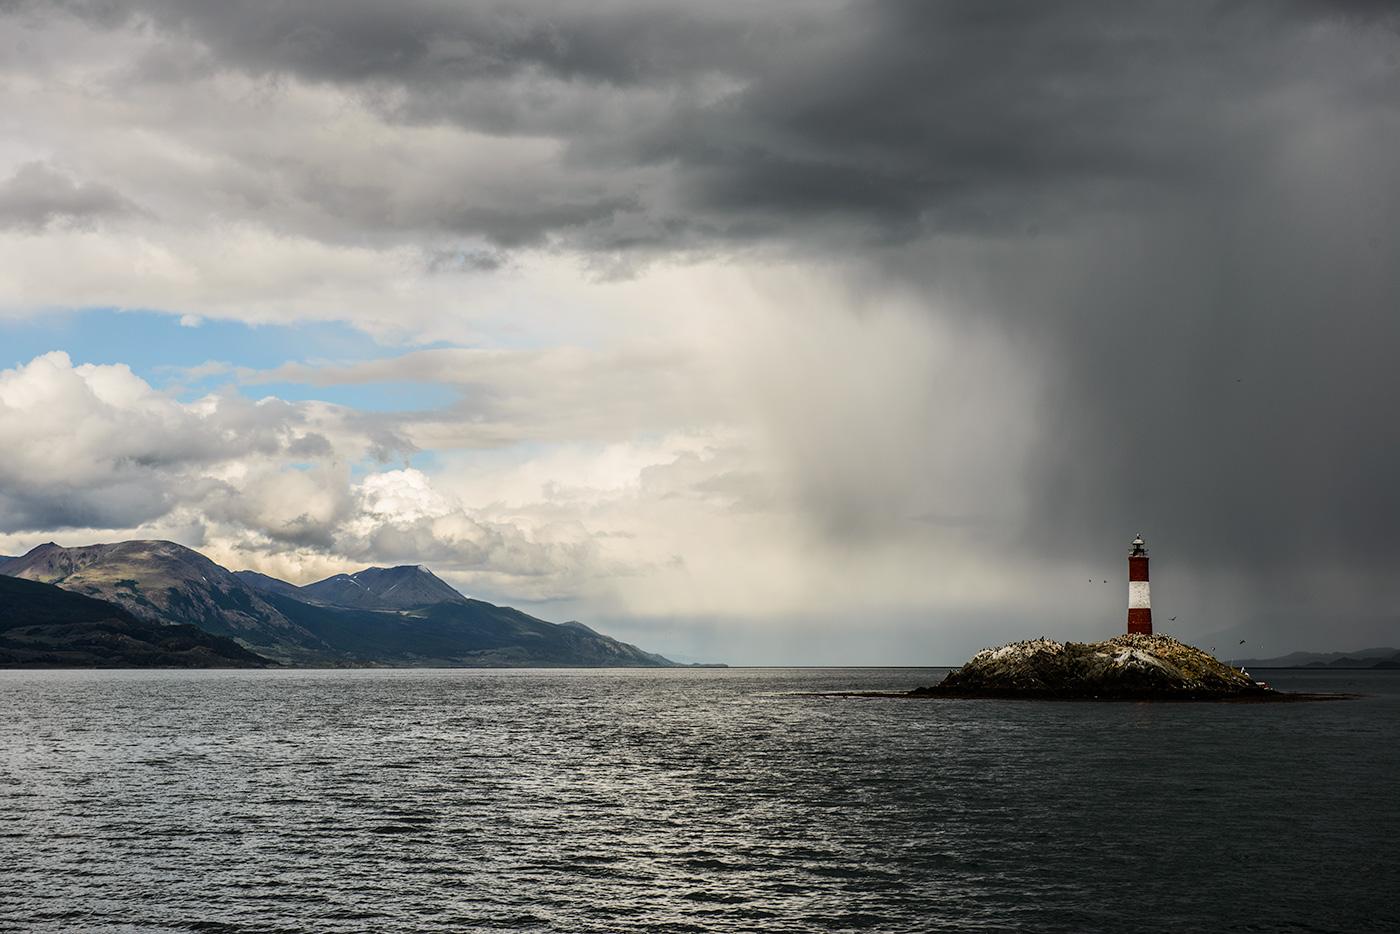 Patagonia, Ushuaia, Beagle Channel